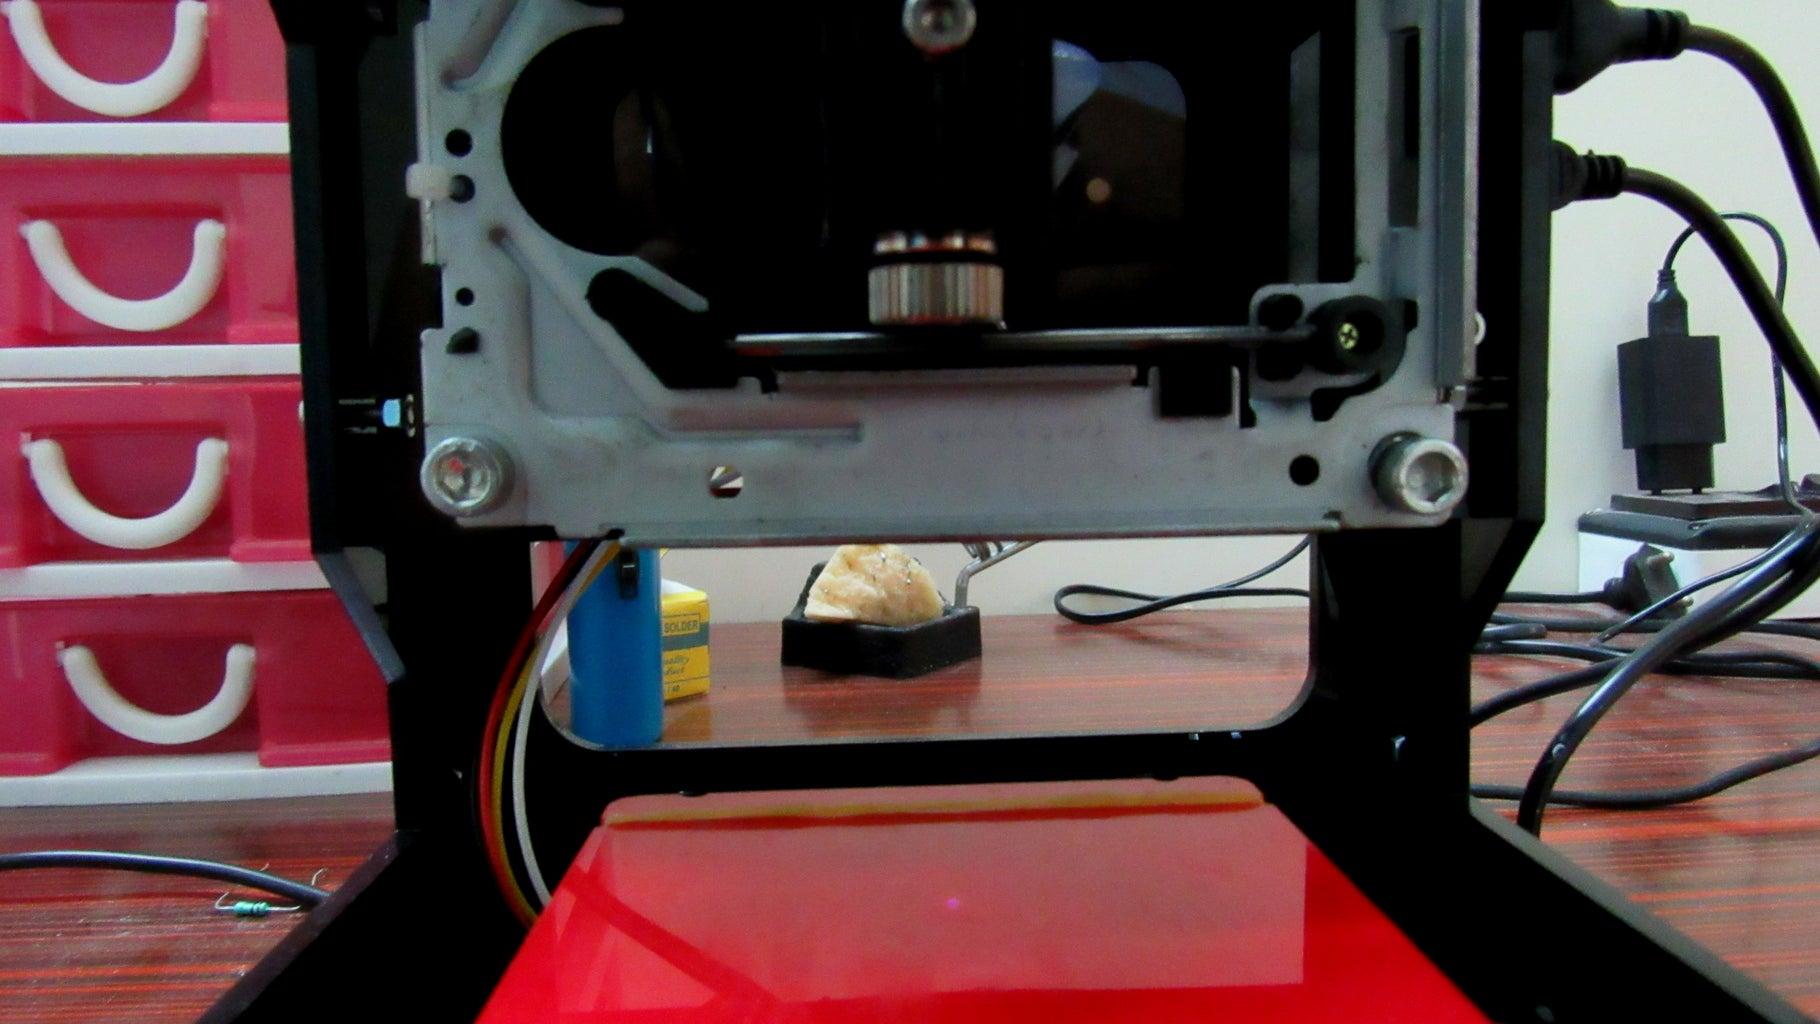 The  Laser Engraving Machine